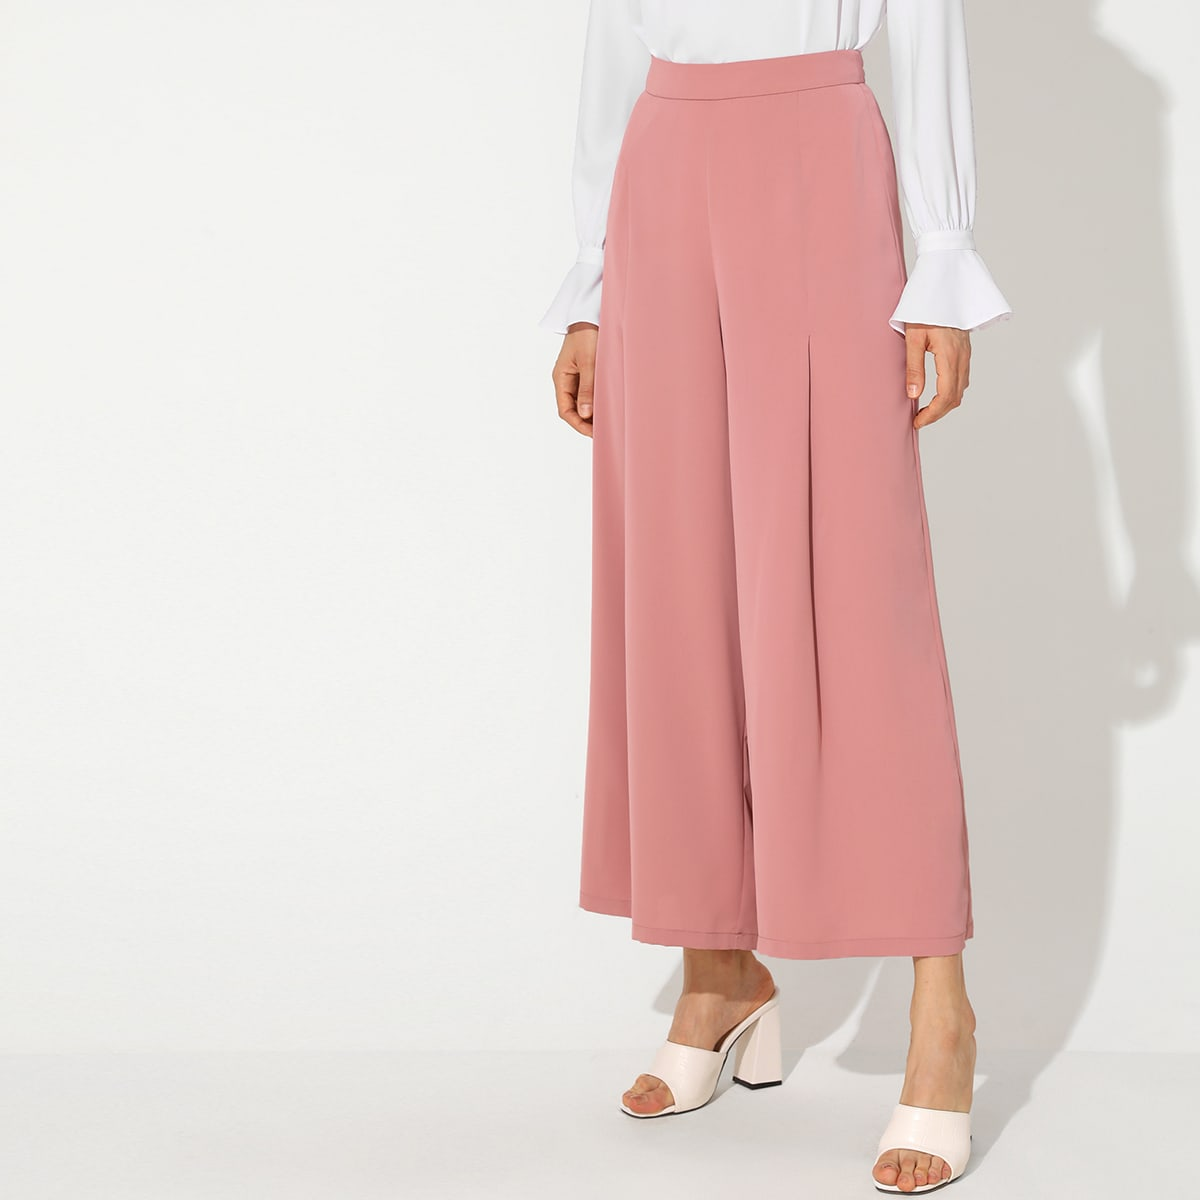 Широкие брюки со складкой фото